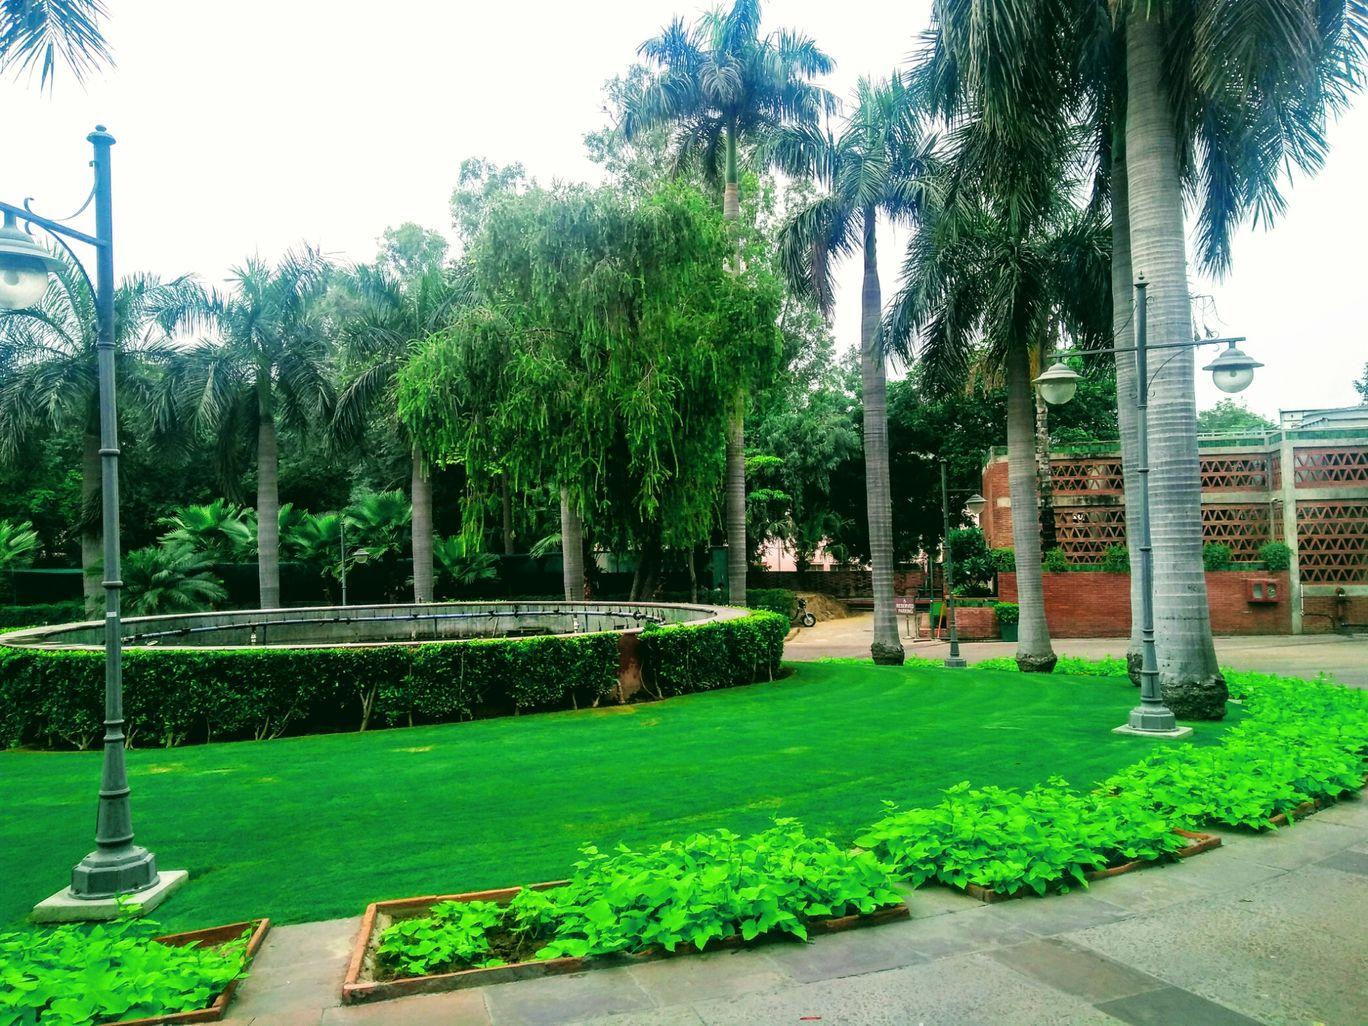 Photo of India Habitat Centre Gate No. 3 By Mohsin Wali